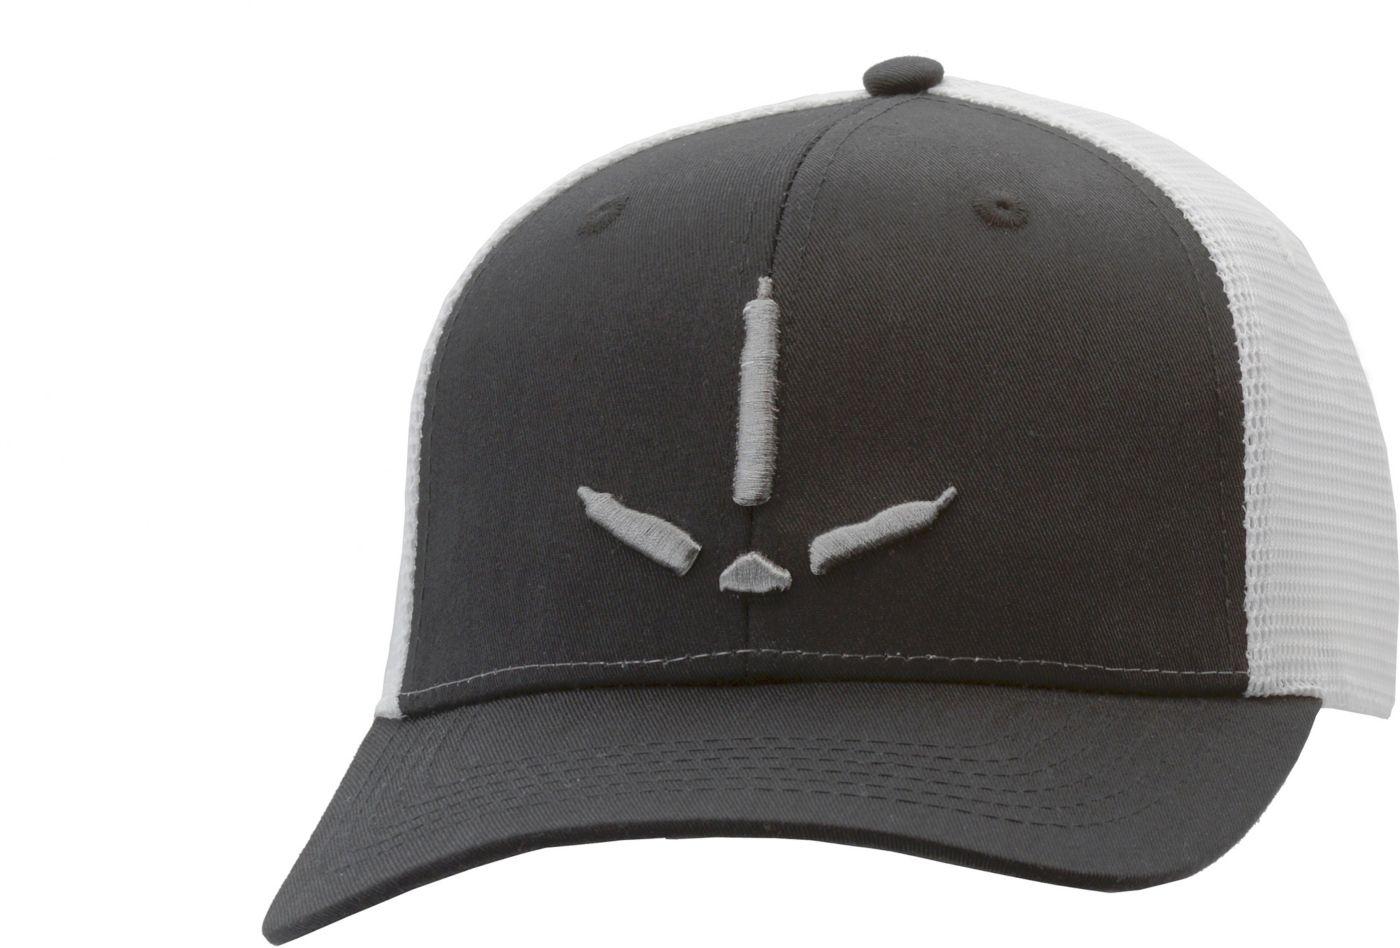 NOMAD Men's Turkey Track Trucker Hat